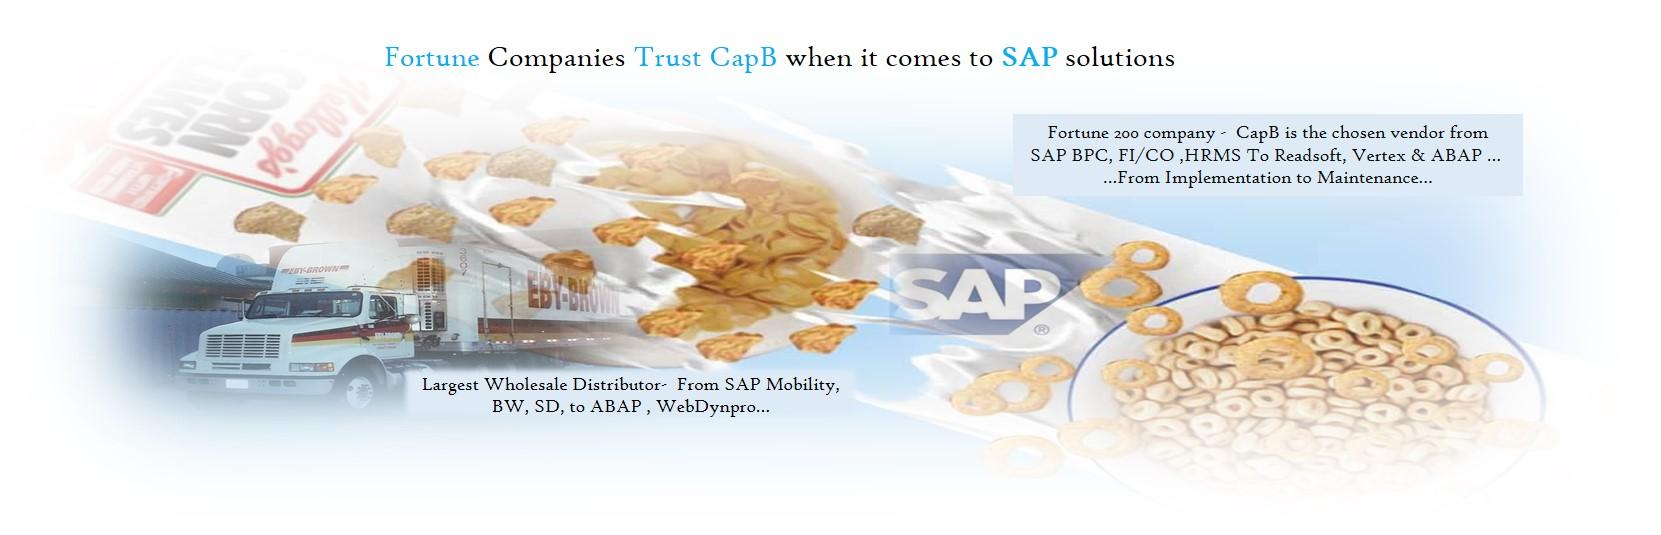 CAPB-SAP-SOLUTION-GLOBAL-IMPLEMENTATION-FORTUNE-50-SAP-BPC-BW-ABAP-BASIS-MOBILITY-WEBDYNPRO-SD-LE-MM-PP-PI-READSOFT-VERTEX-TRANSPORTATION-WAREHOUSE-TPO-BASIS-FSCM-FICO-CLOUD-IDS-SCHEER-PROJECT-SUP-SMP-2